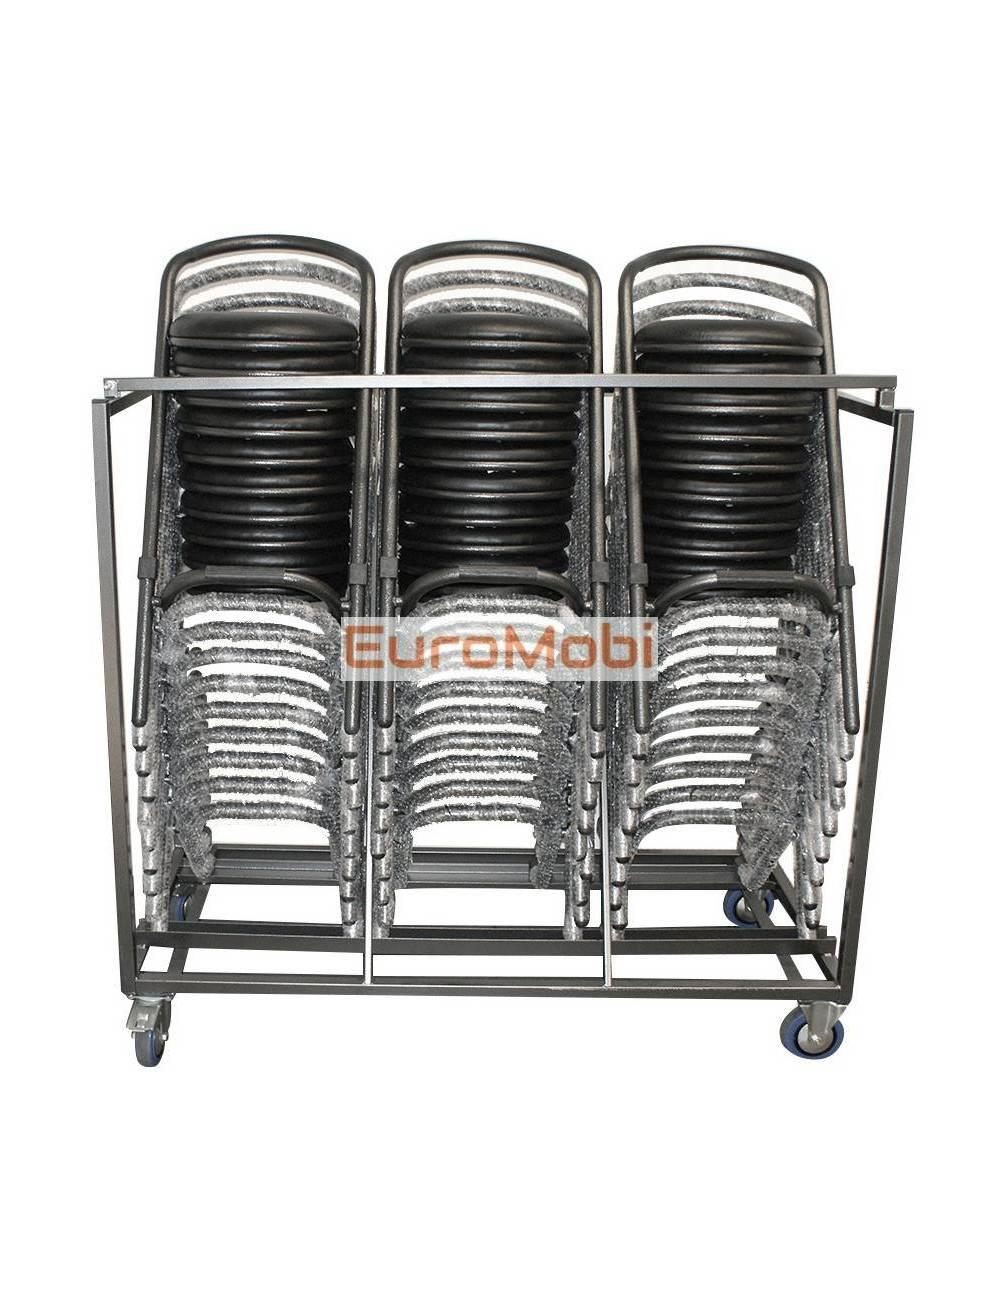 Transport trolley bar stools Tabsu full